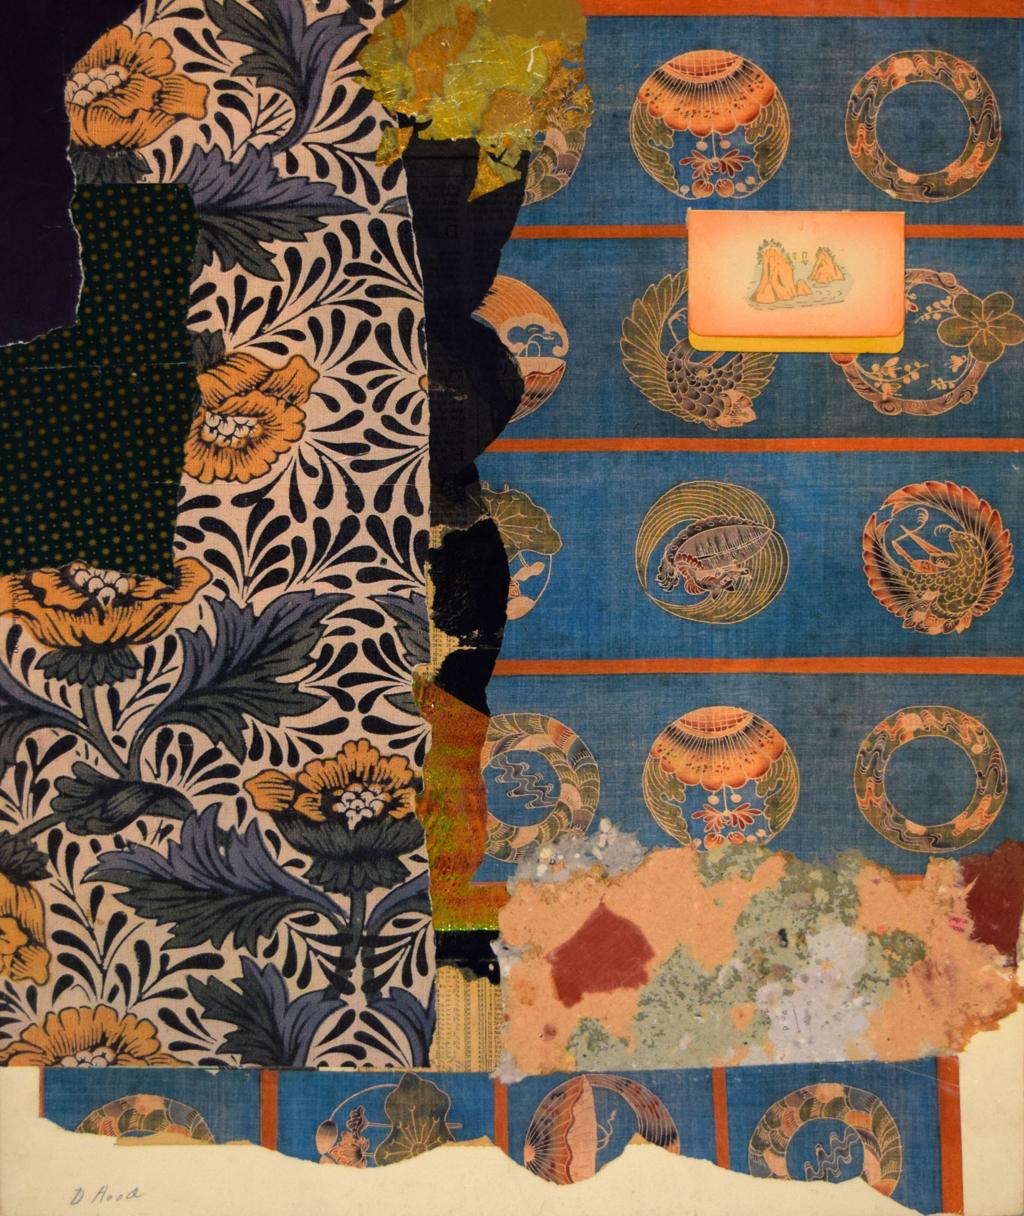 Invitation to Japan by Dorothy Hood